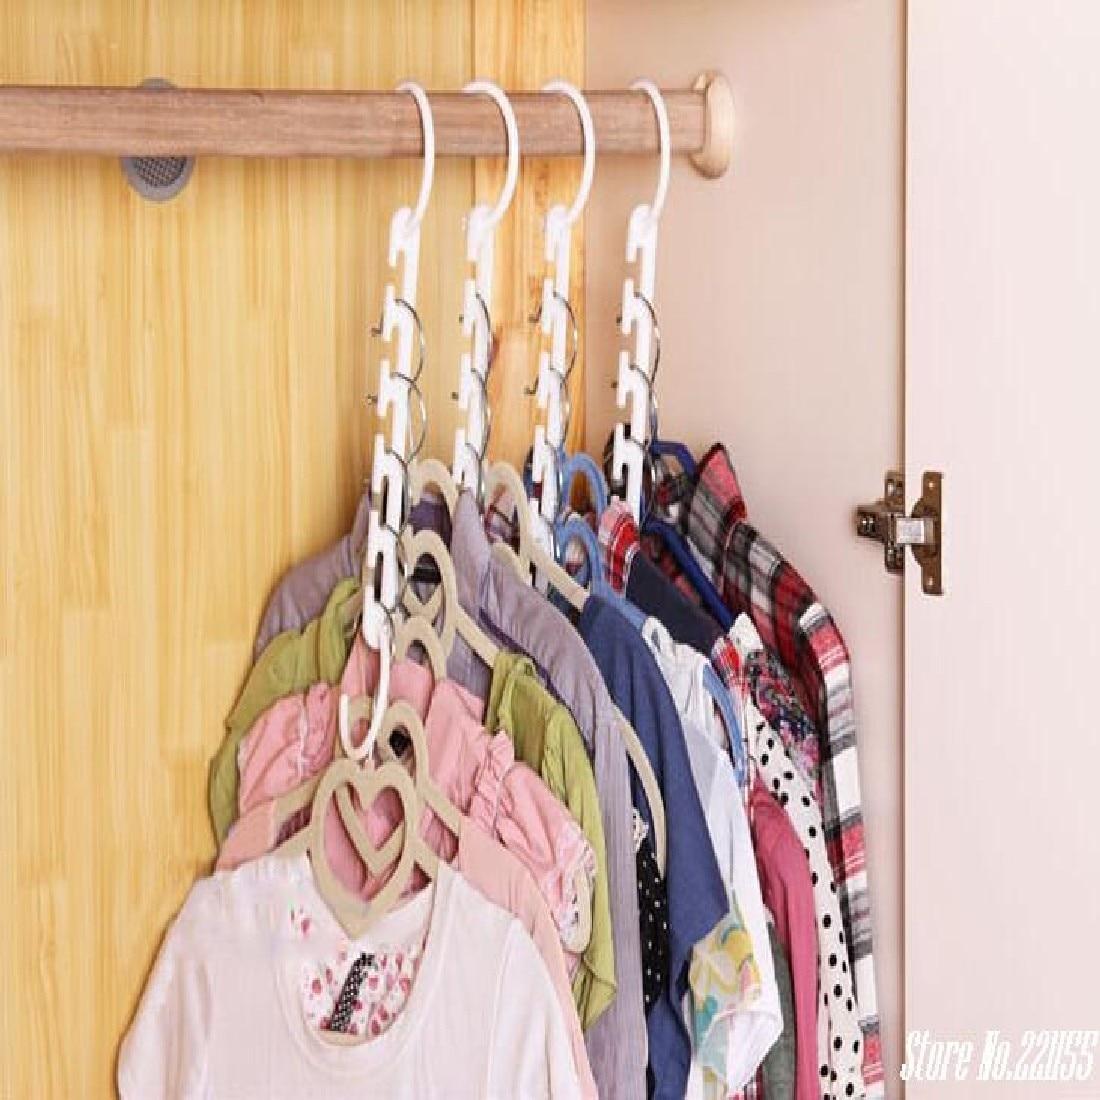 8Pcs/lot Clothes Hanger Rack Wardrobes Shop Closet Wardrobe Clothing Hooks Space Saver Home Organizer Set